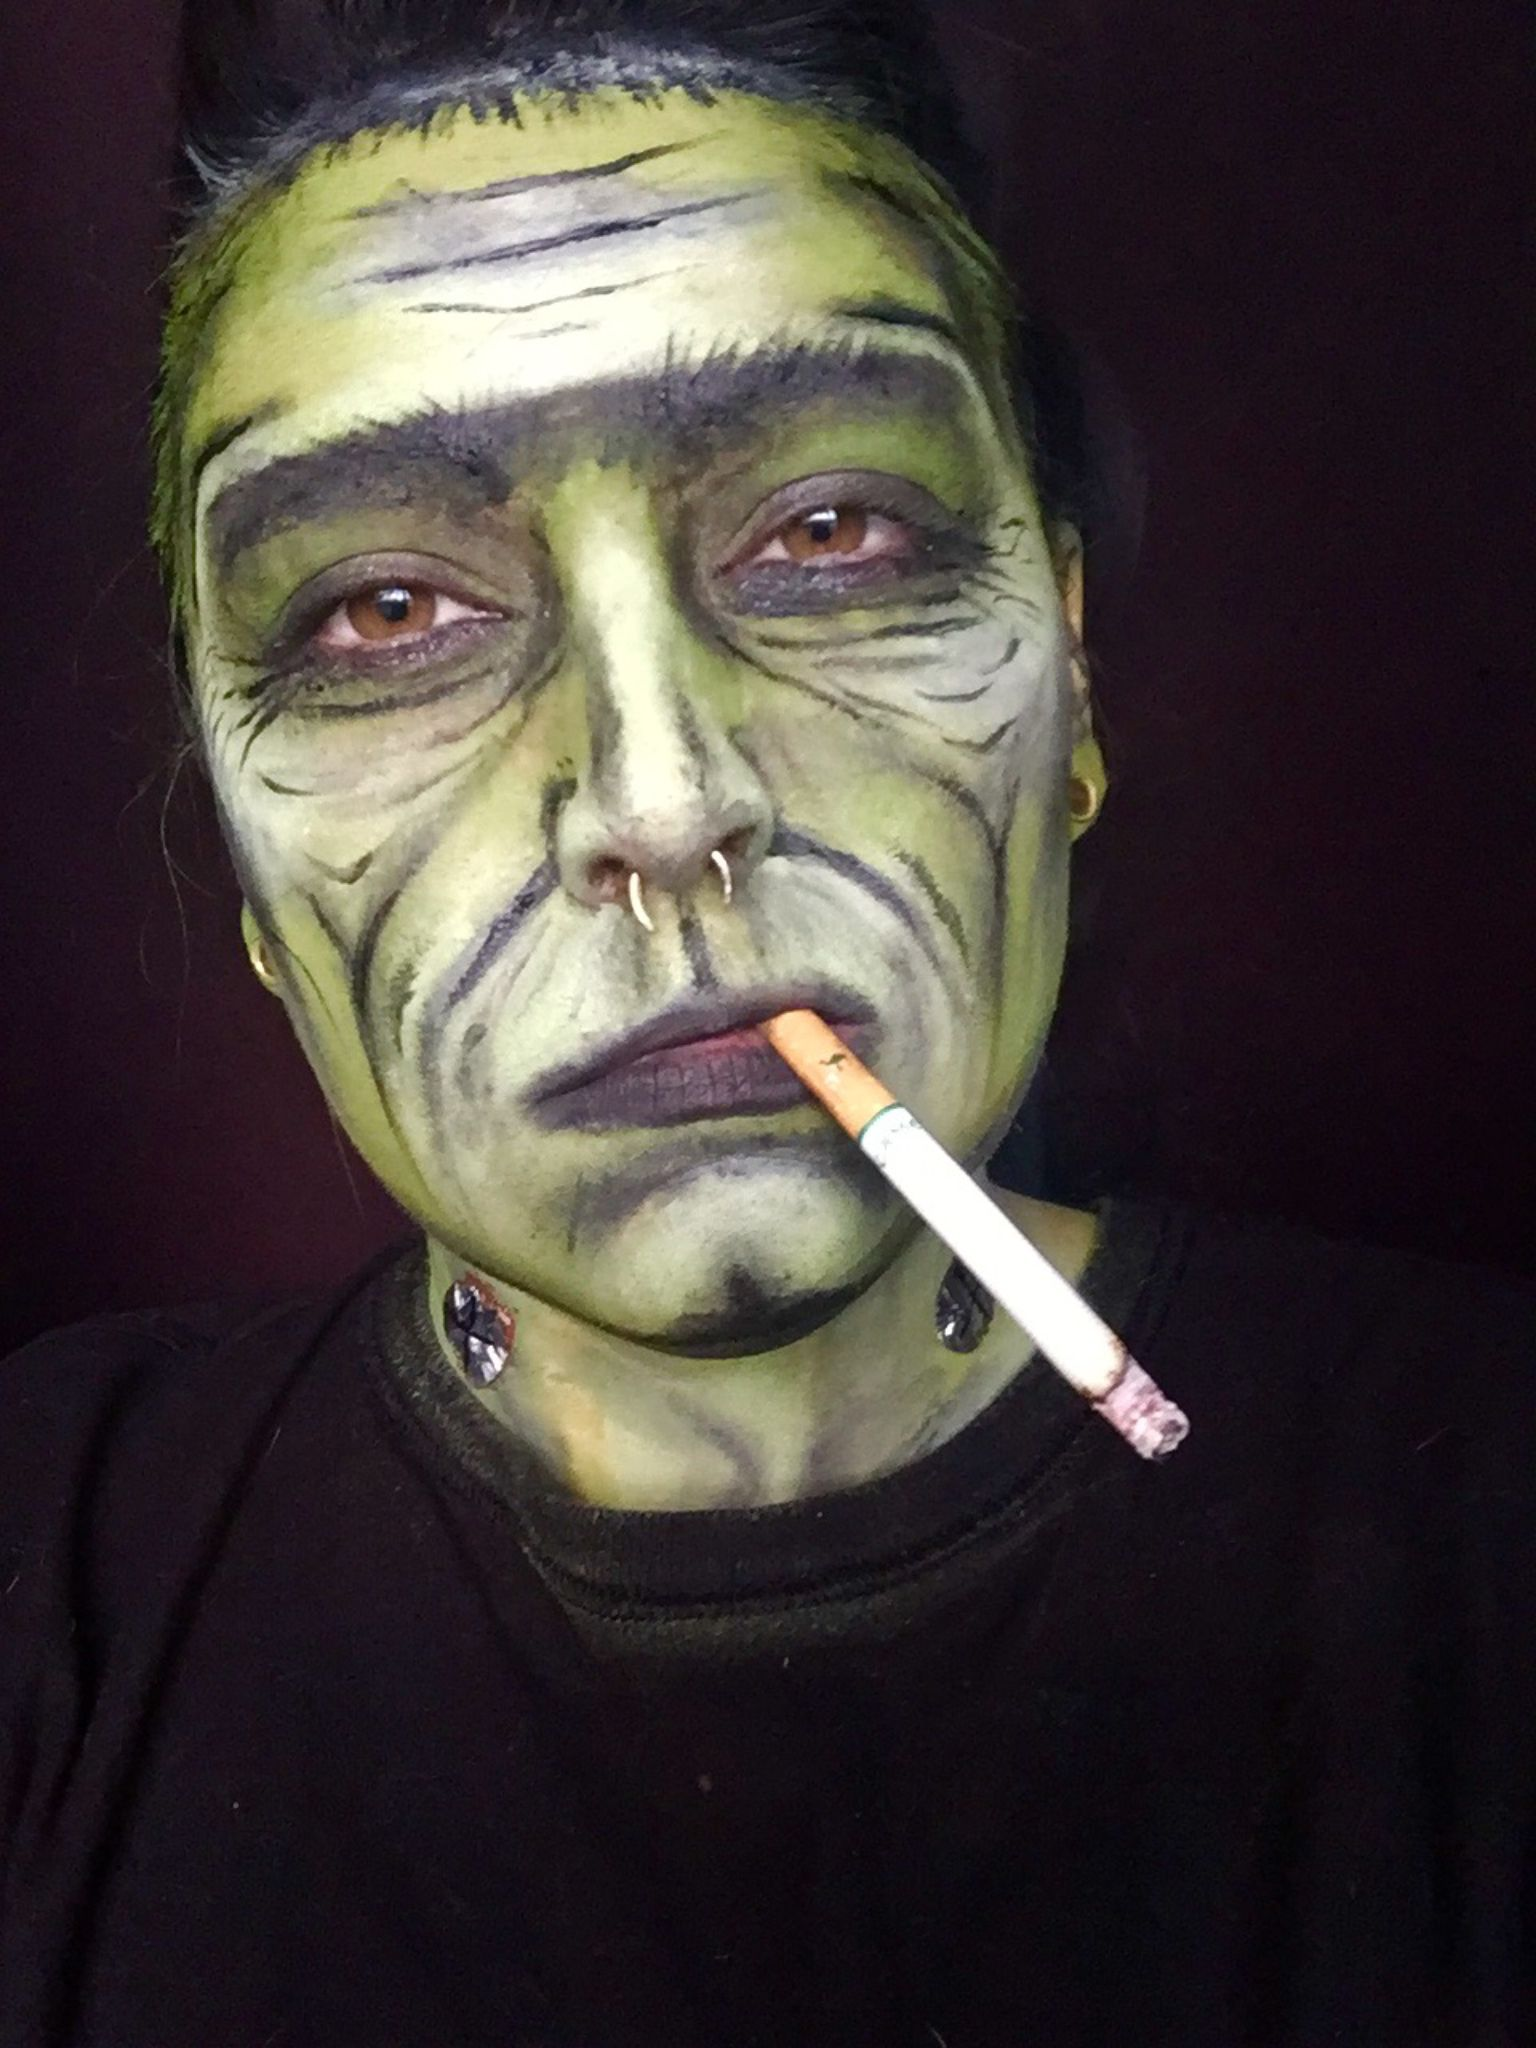 Frankenstein makeup Halloween face paint dude guy man (but ...